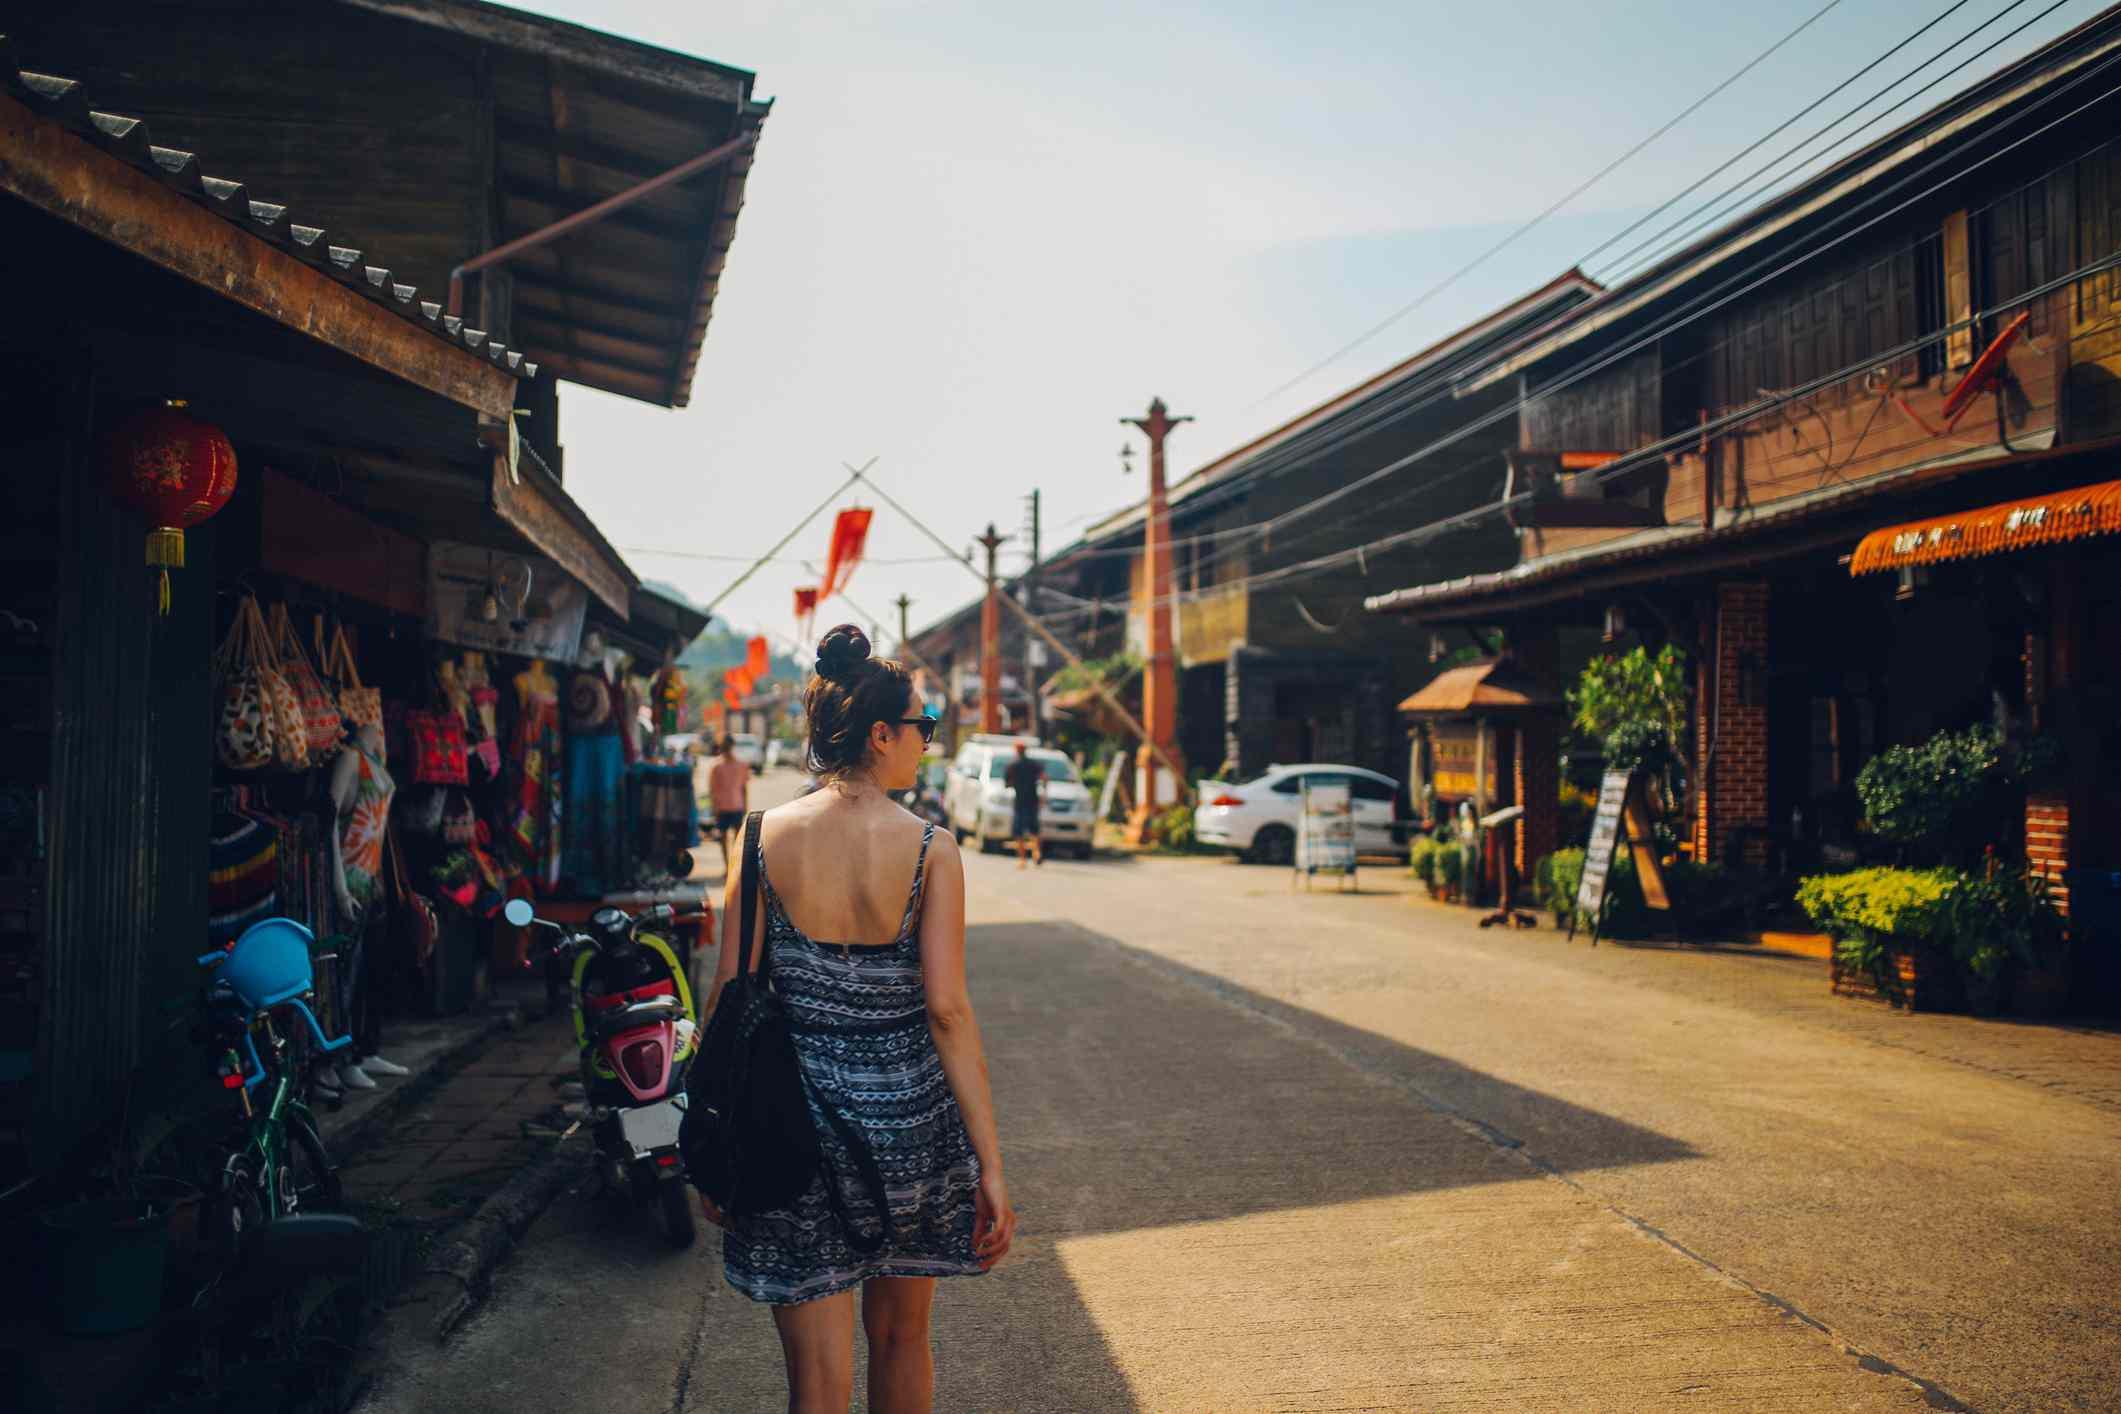 Rear view of young woman walking through Koh Lanta Old Town streets